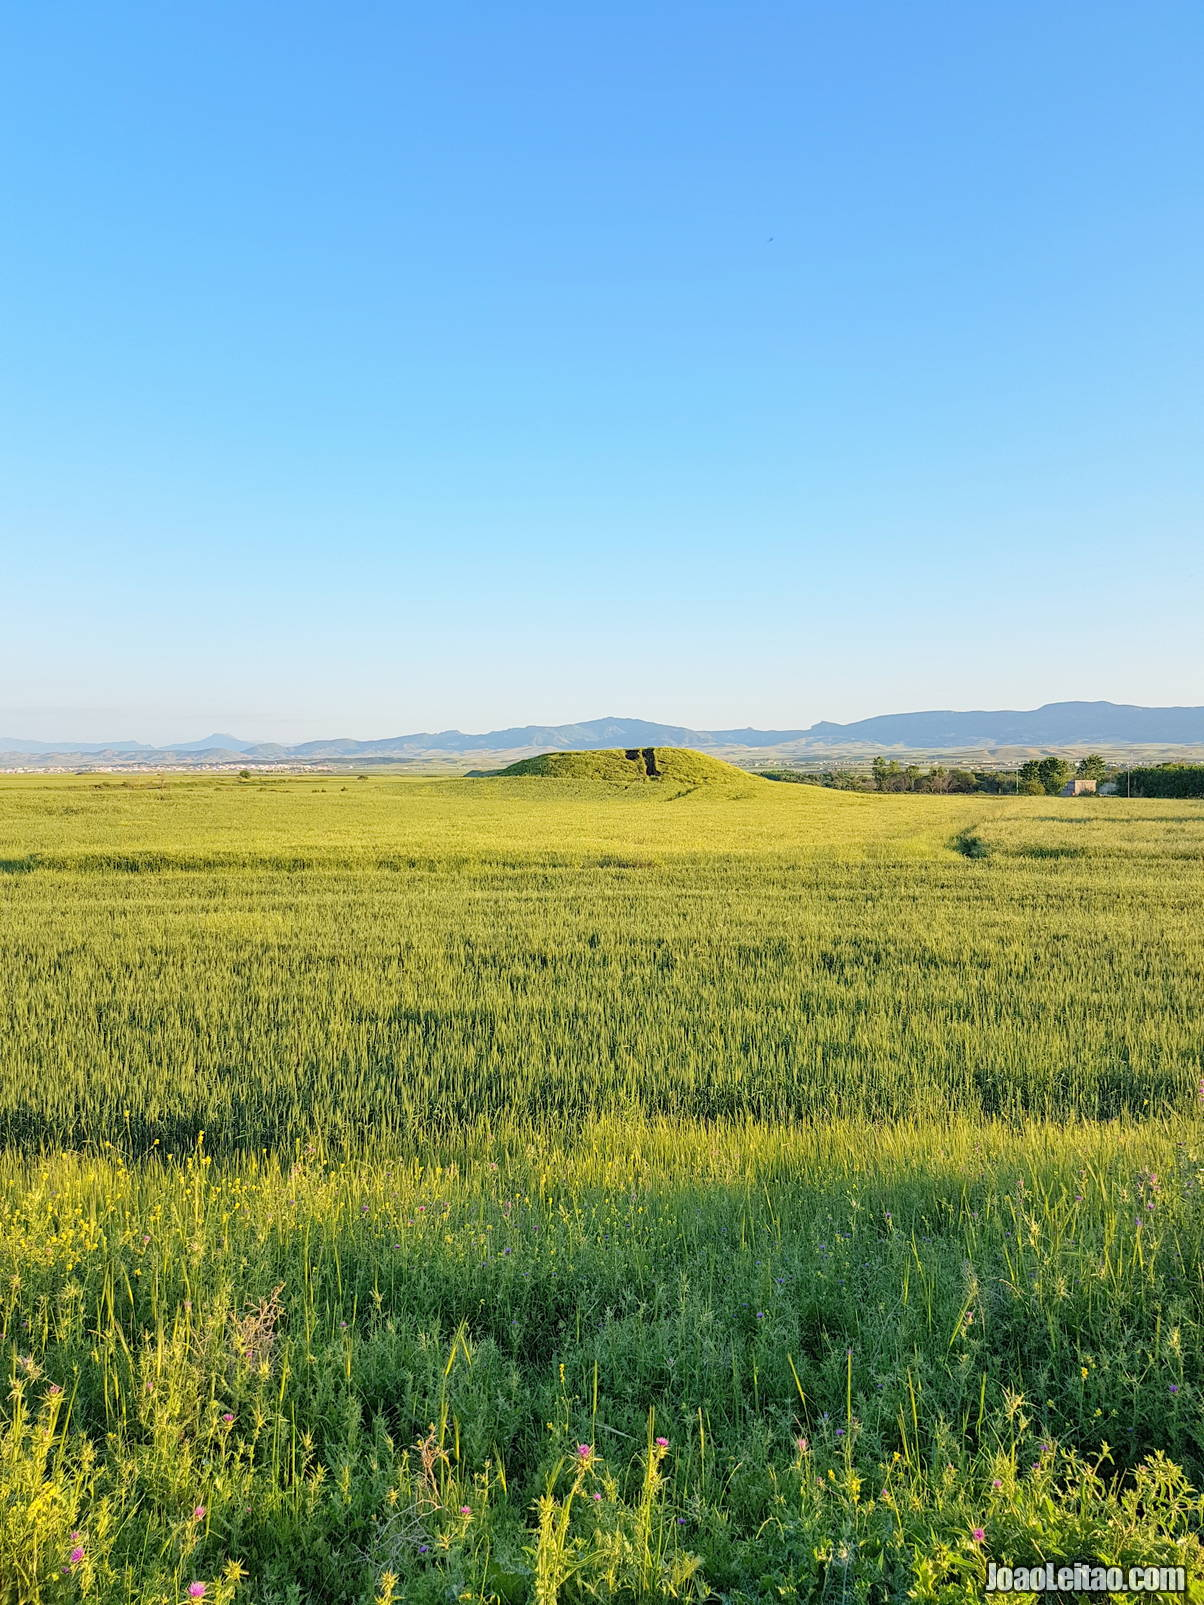 Visit Yasin Tepe in Iraqi Kurdistan